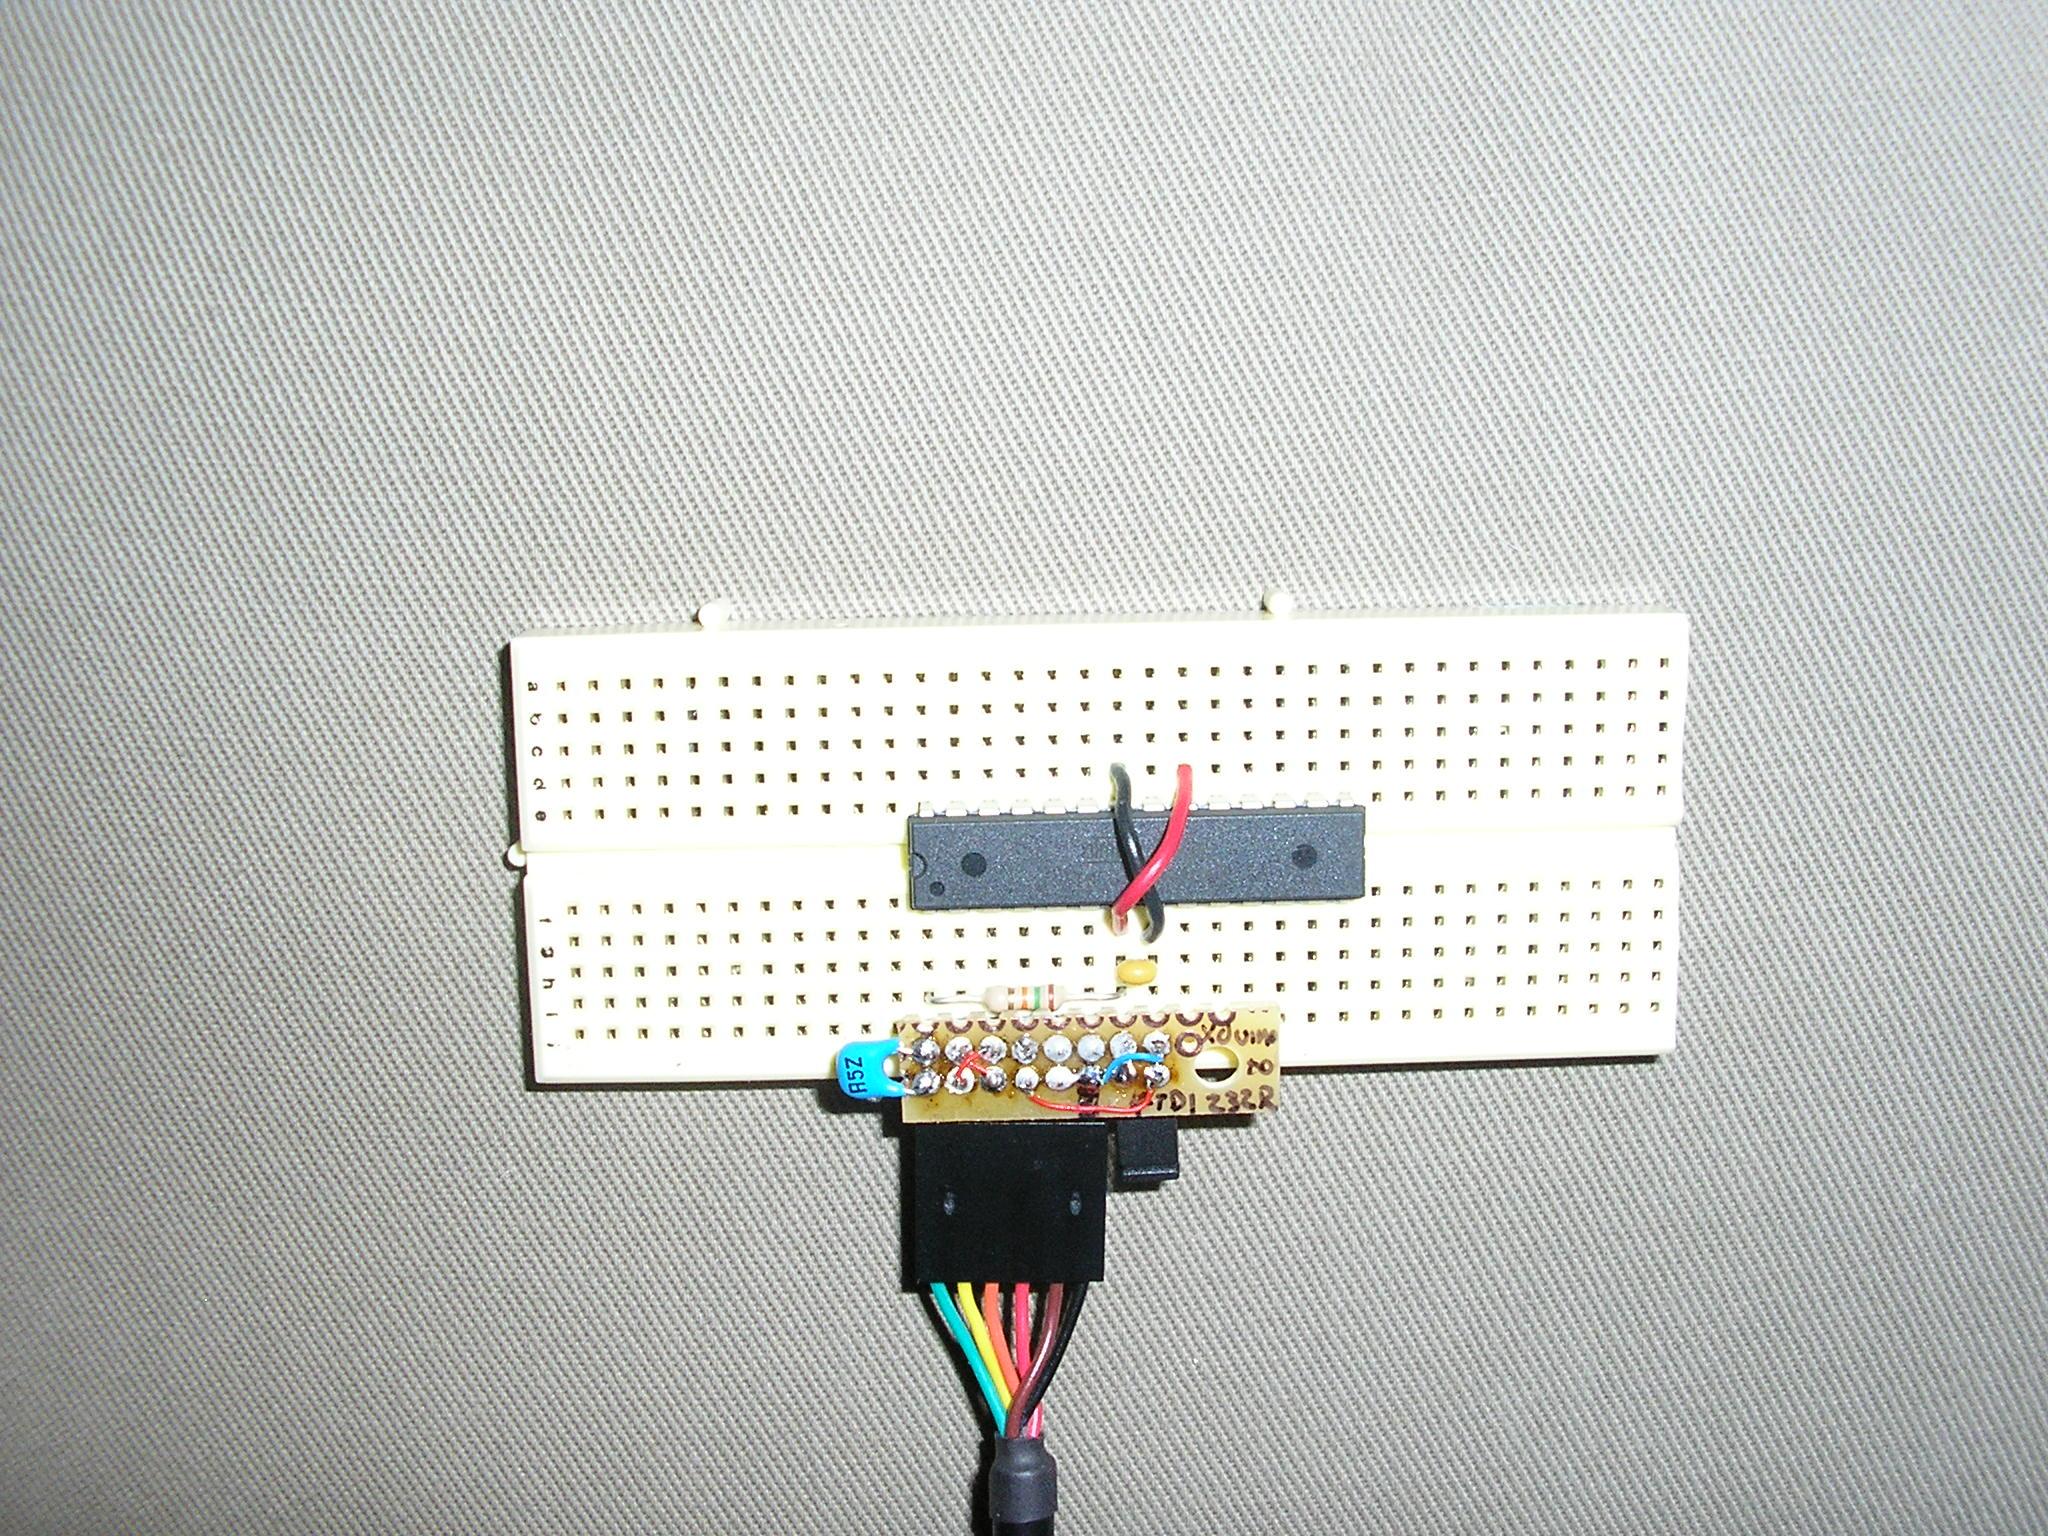 uDuino: Very Low Cost Arduino Compatible Development Board